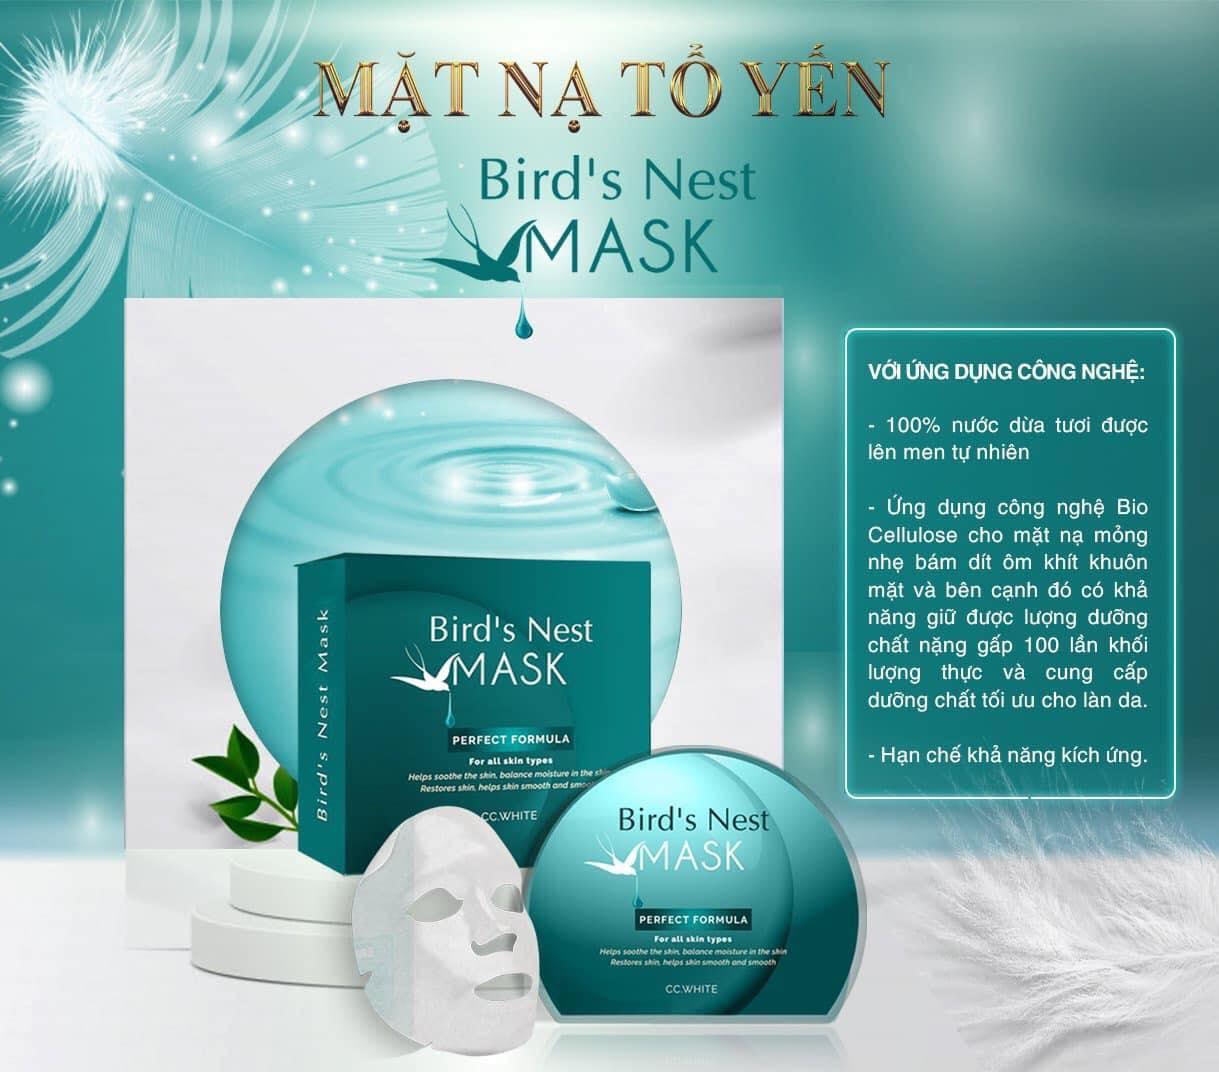 Bird's Nest Mask CC White - Mặt nạ tổ yến CC White